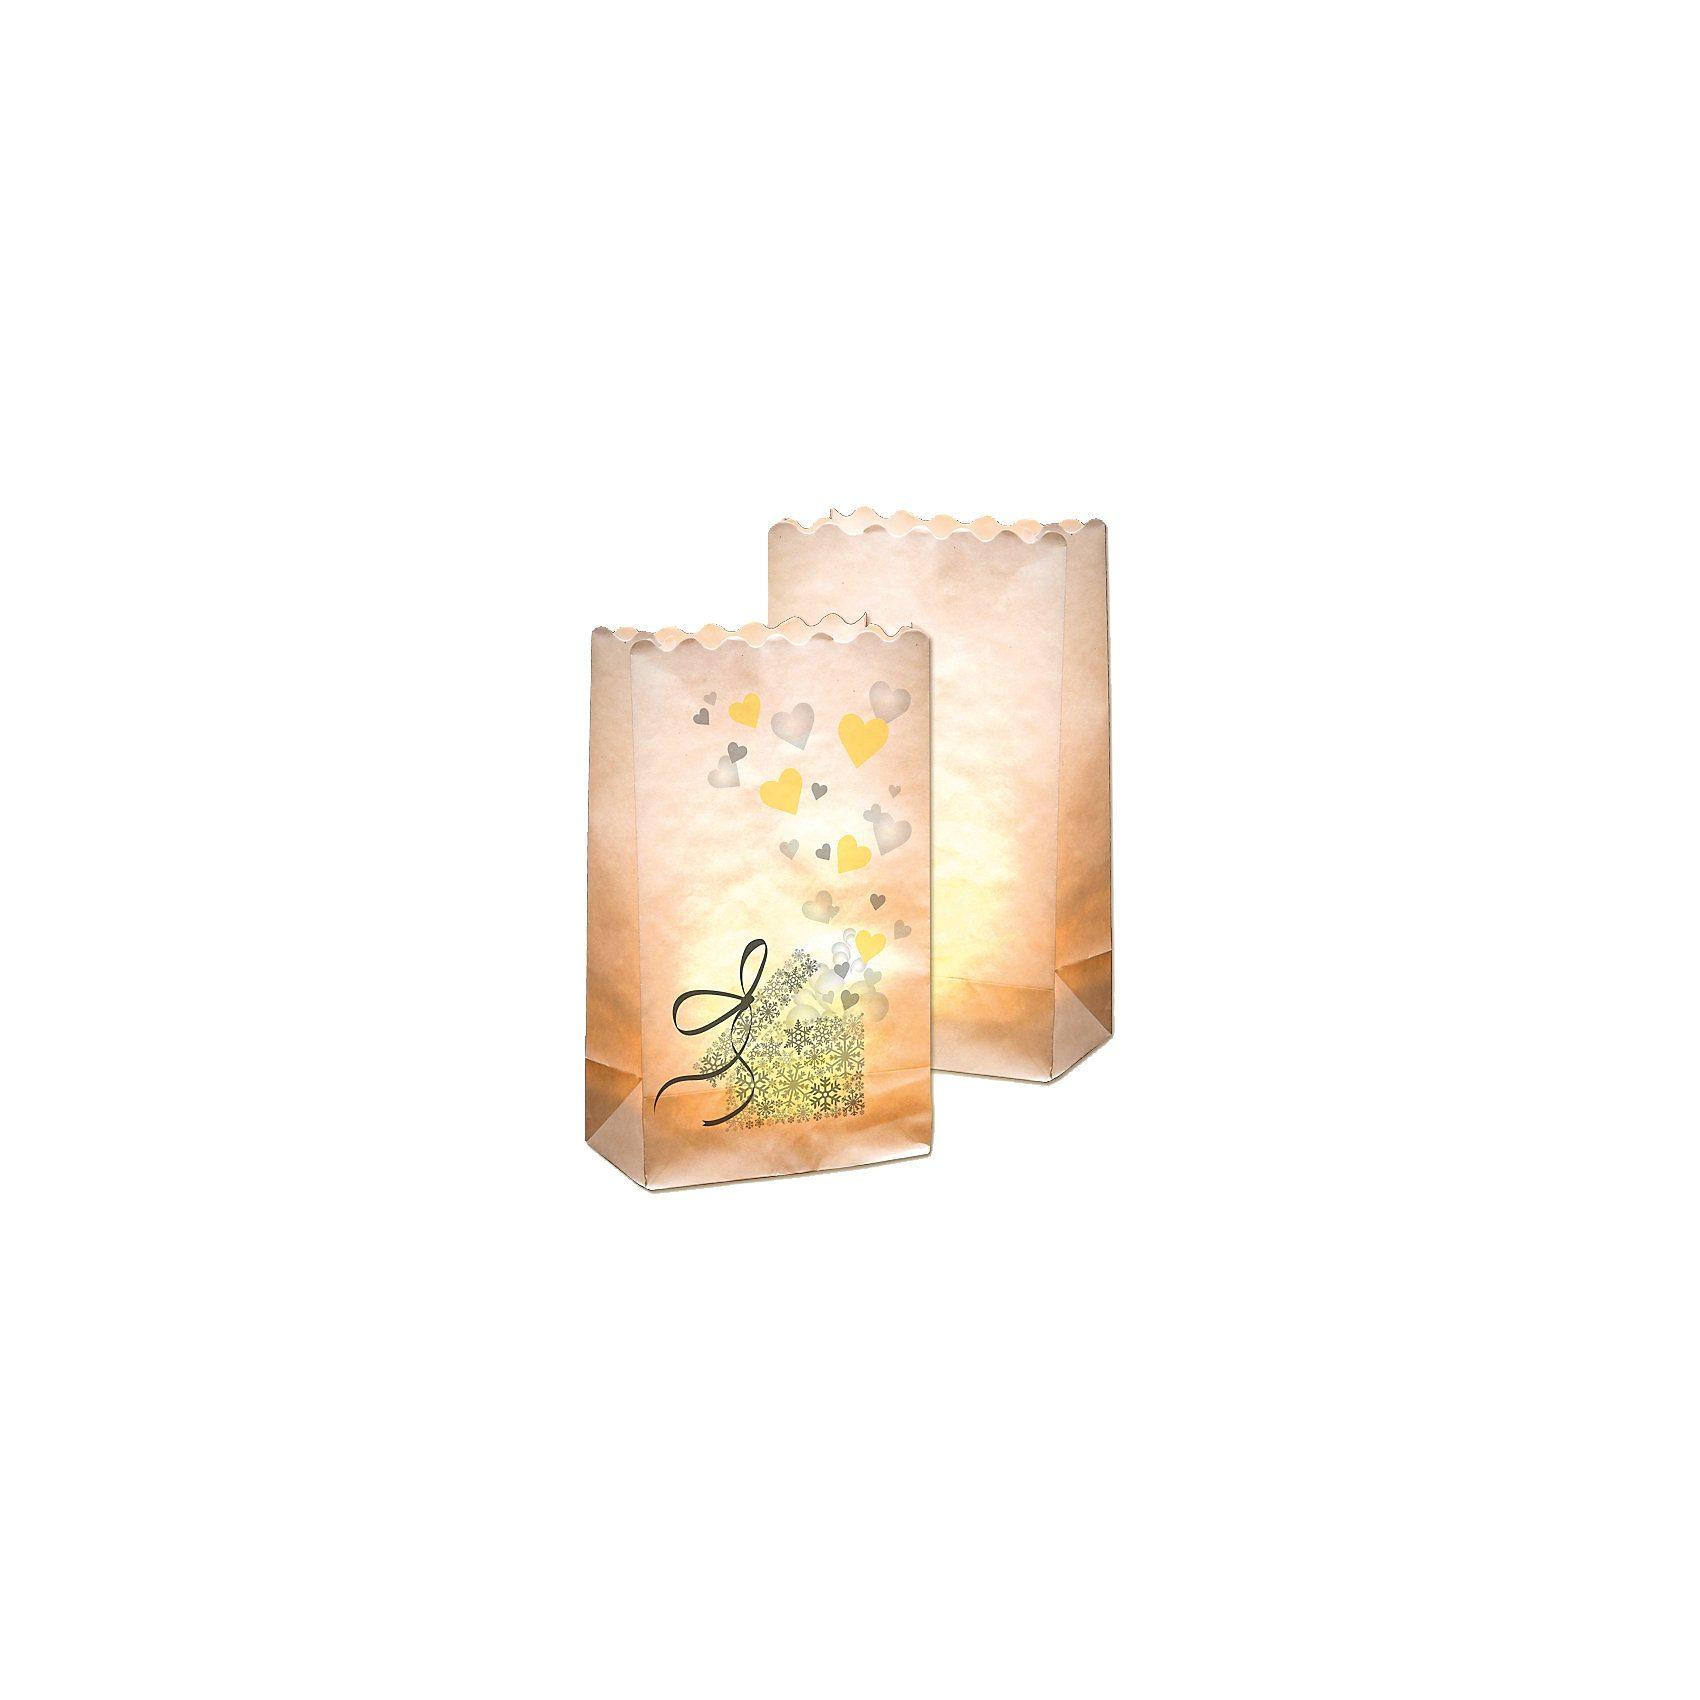 Folia Lichtertüten aus Papier Motiv Geschenk, 10 Stück